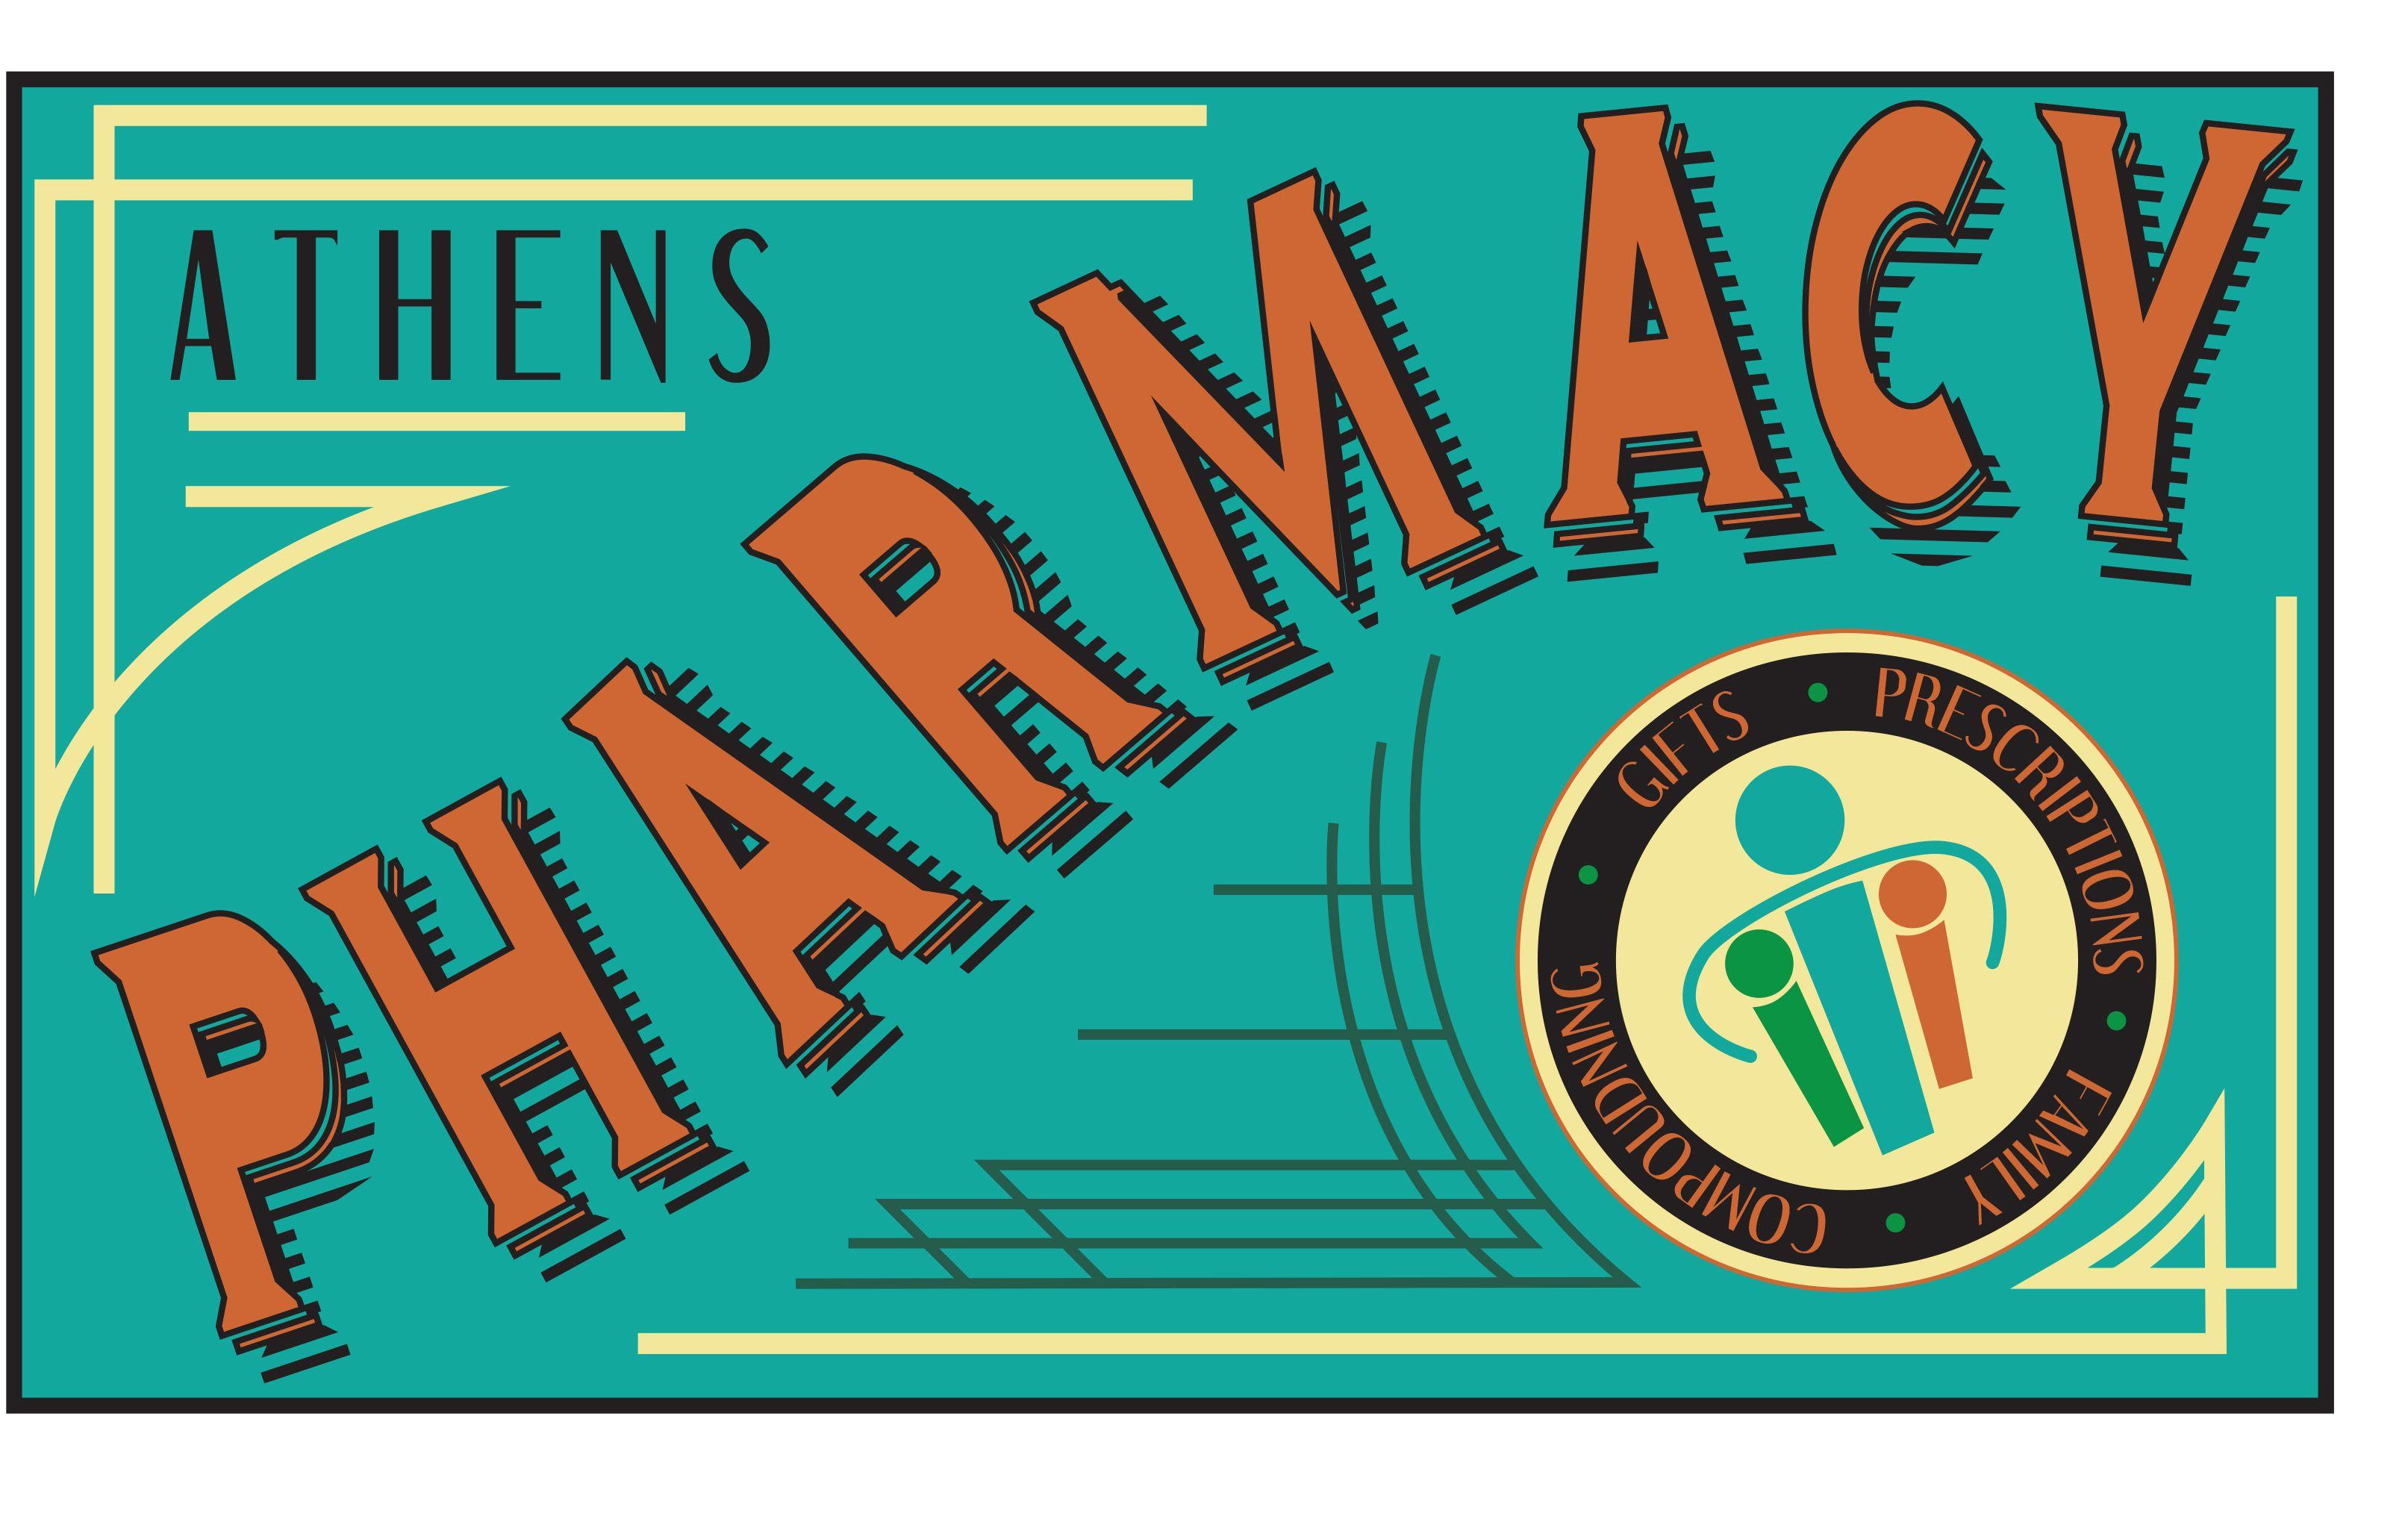 Athens Pharmacy - AL